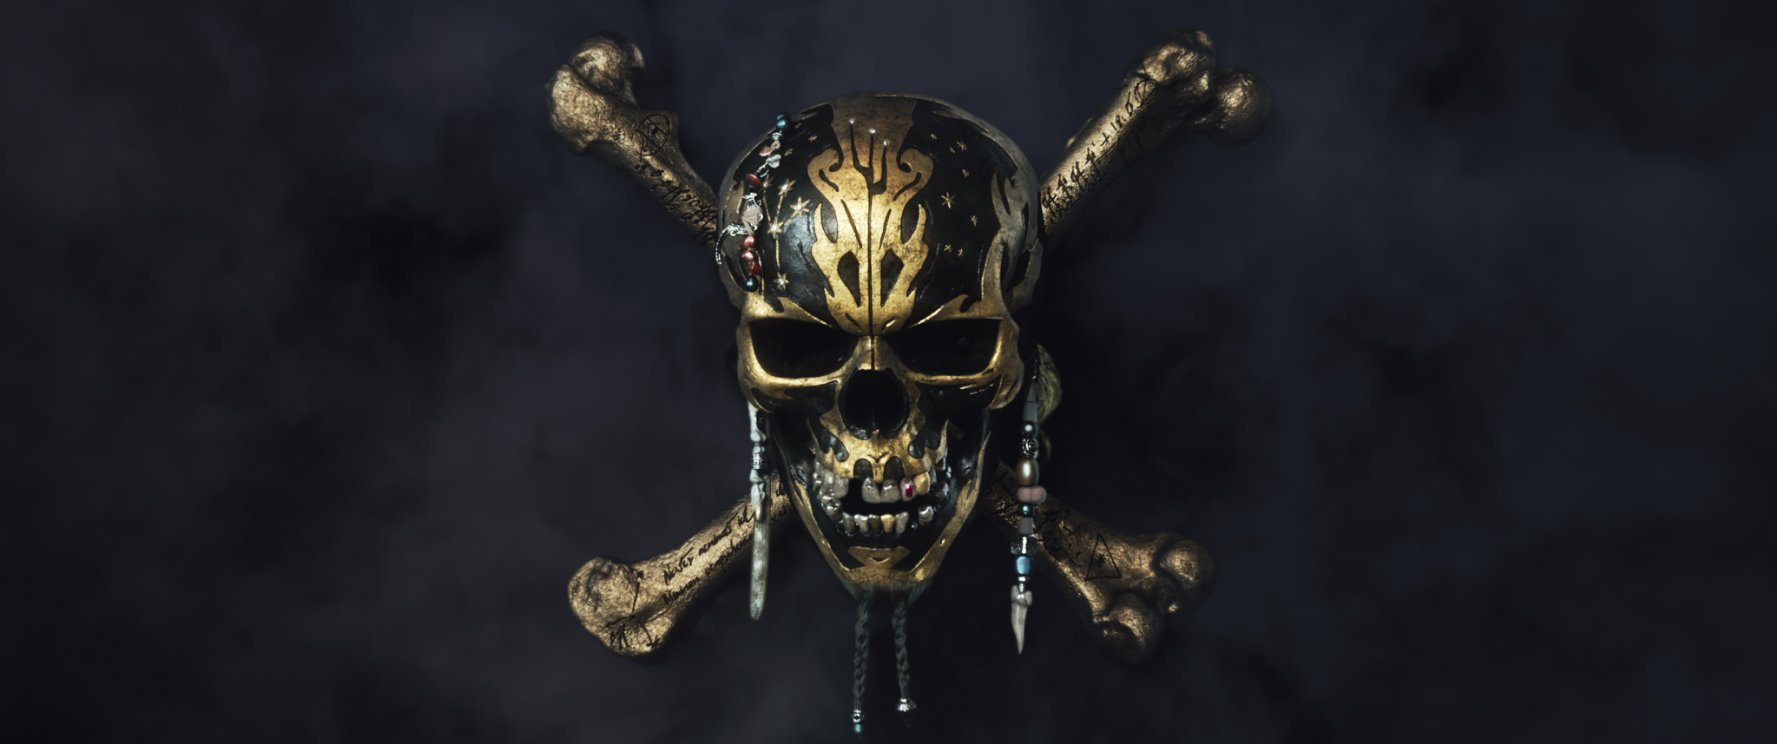 Pirates of the Caribbean: Salazar's Revenge 1